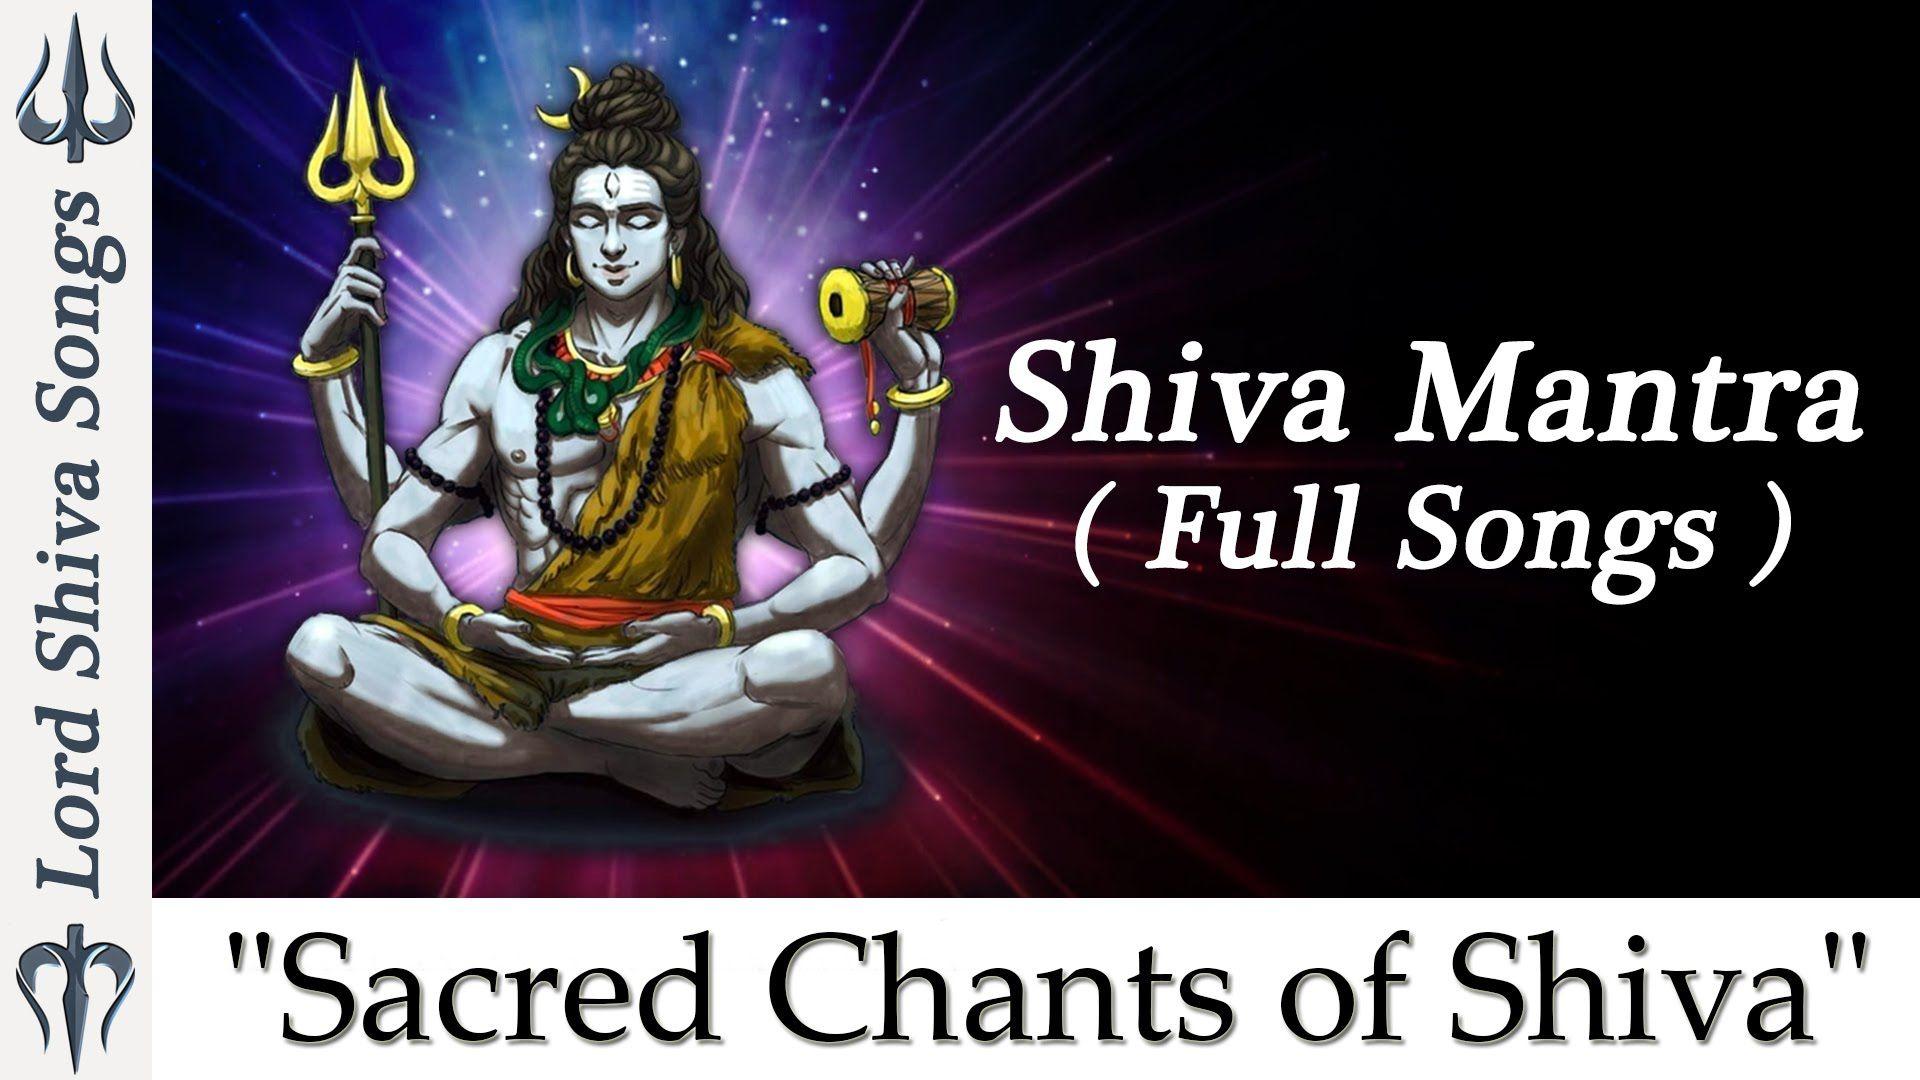 Sacred Chants Of Shiva Mantra Shiva Stotram Shiva Tandava Stotram Mahamrityunjay Mantra Mantras Shiva Stotram Shiva